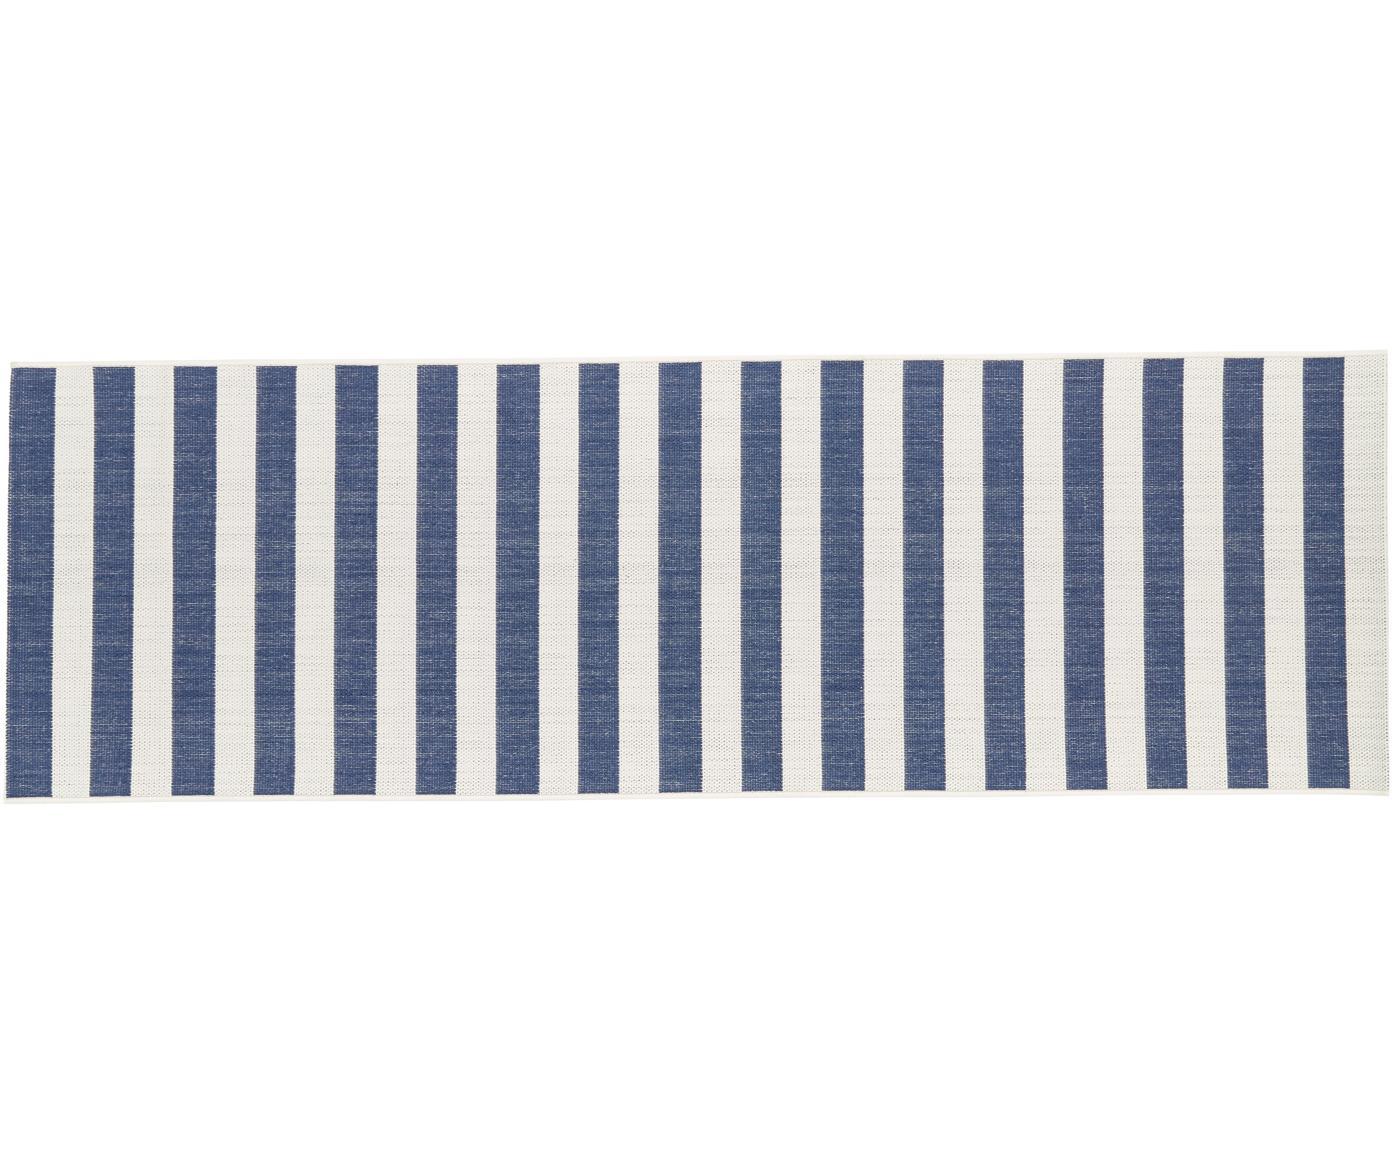 Alfombra de interior/exterior Axa, Parte superior: polipropileno, Reverso: poliéster, Blanco crema, azul, An 80 x L 250 cm